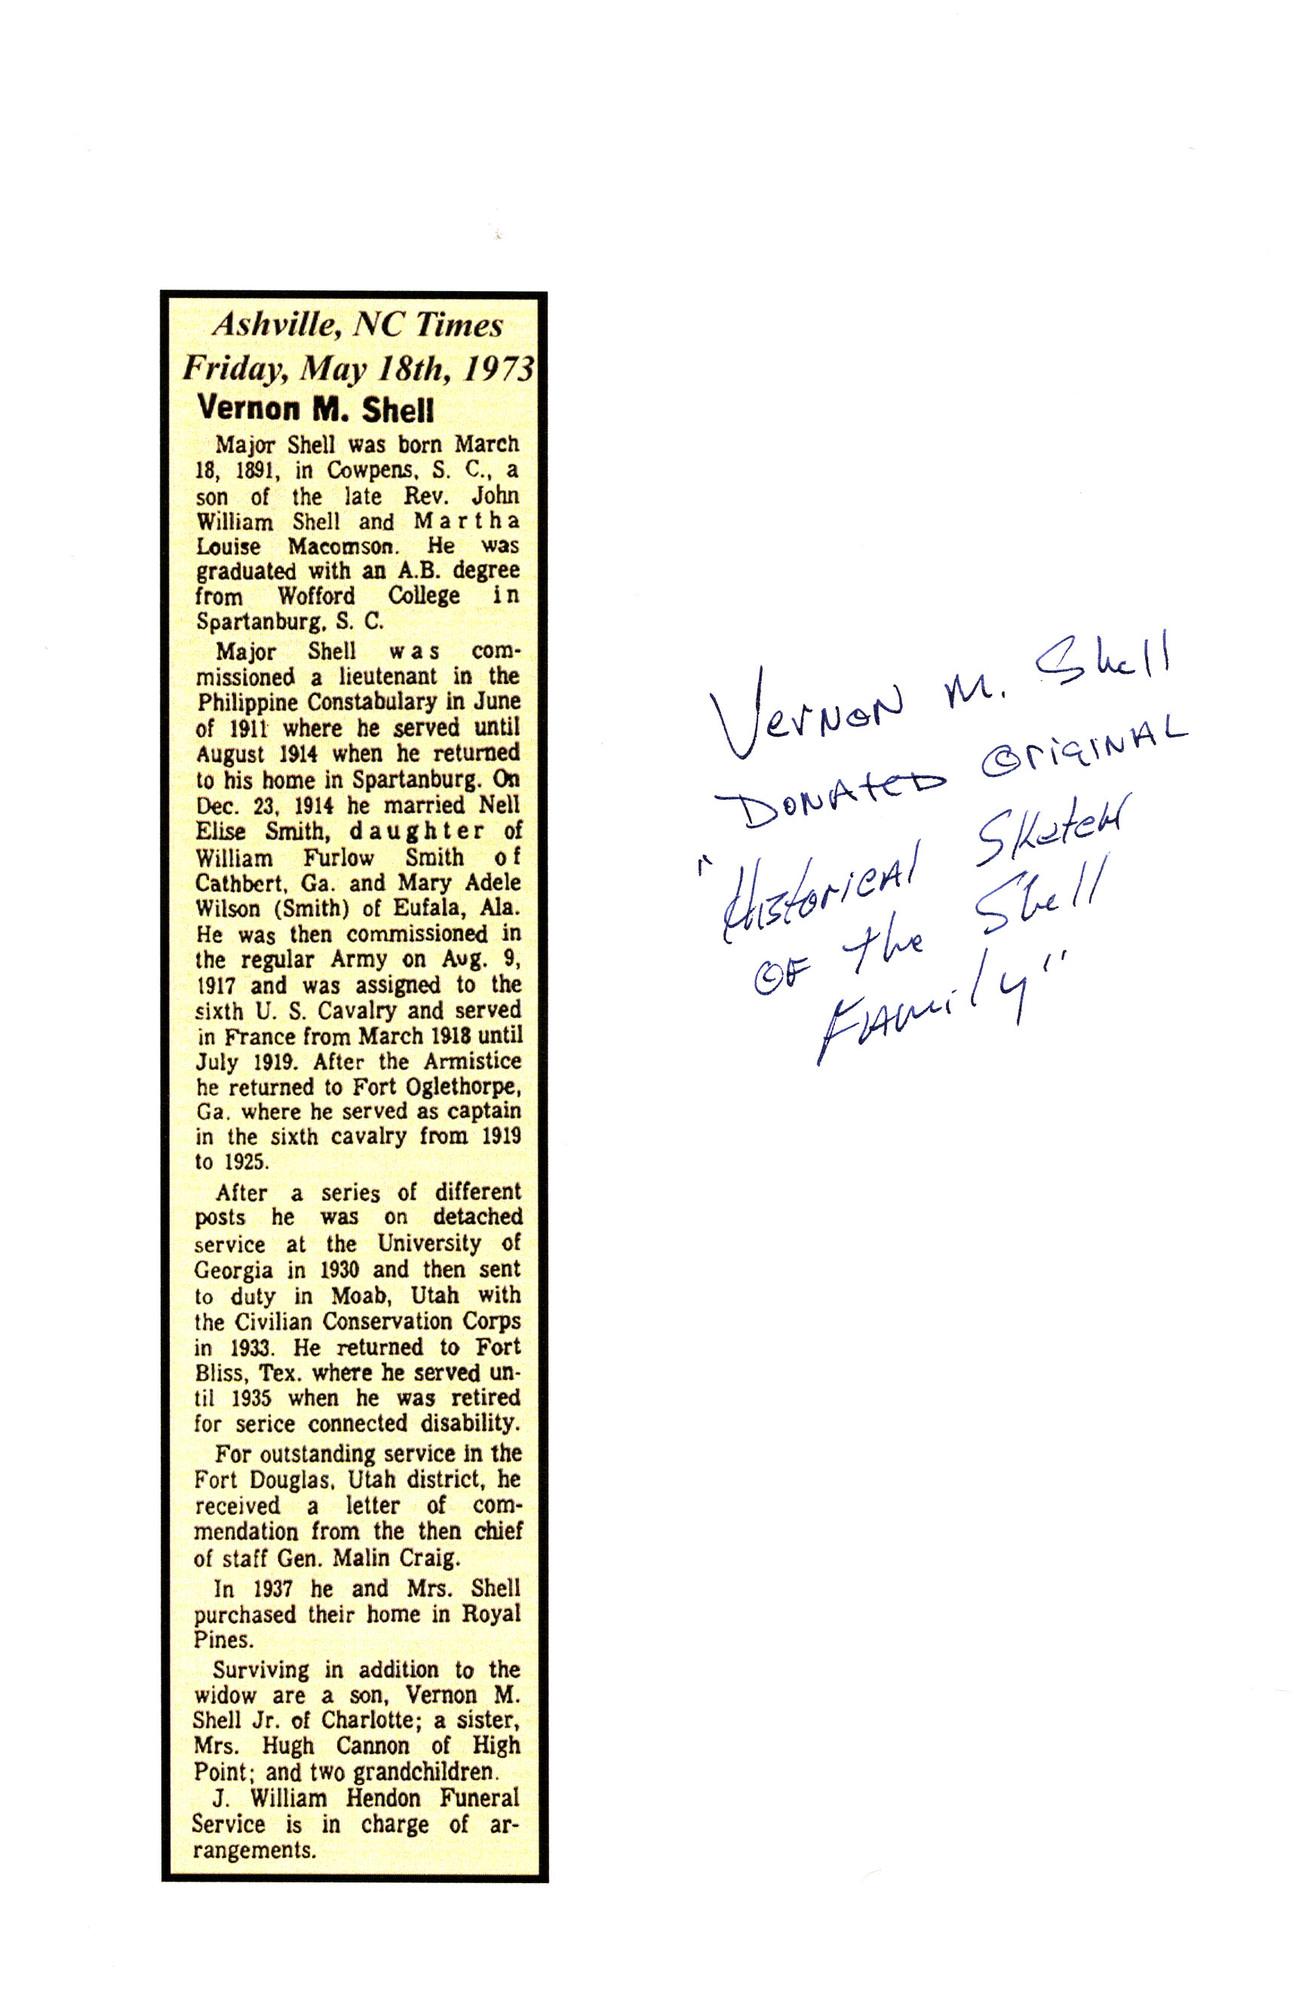 Ms1959_001_AshevilleTimes_1973.jpg